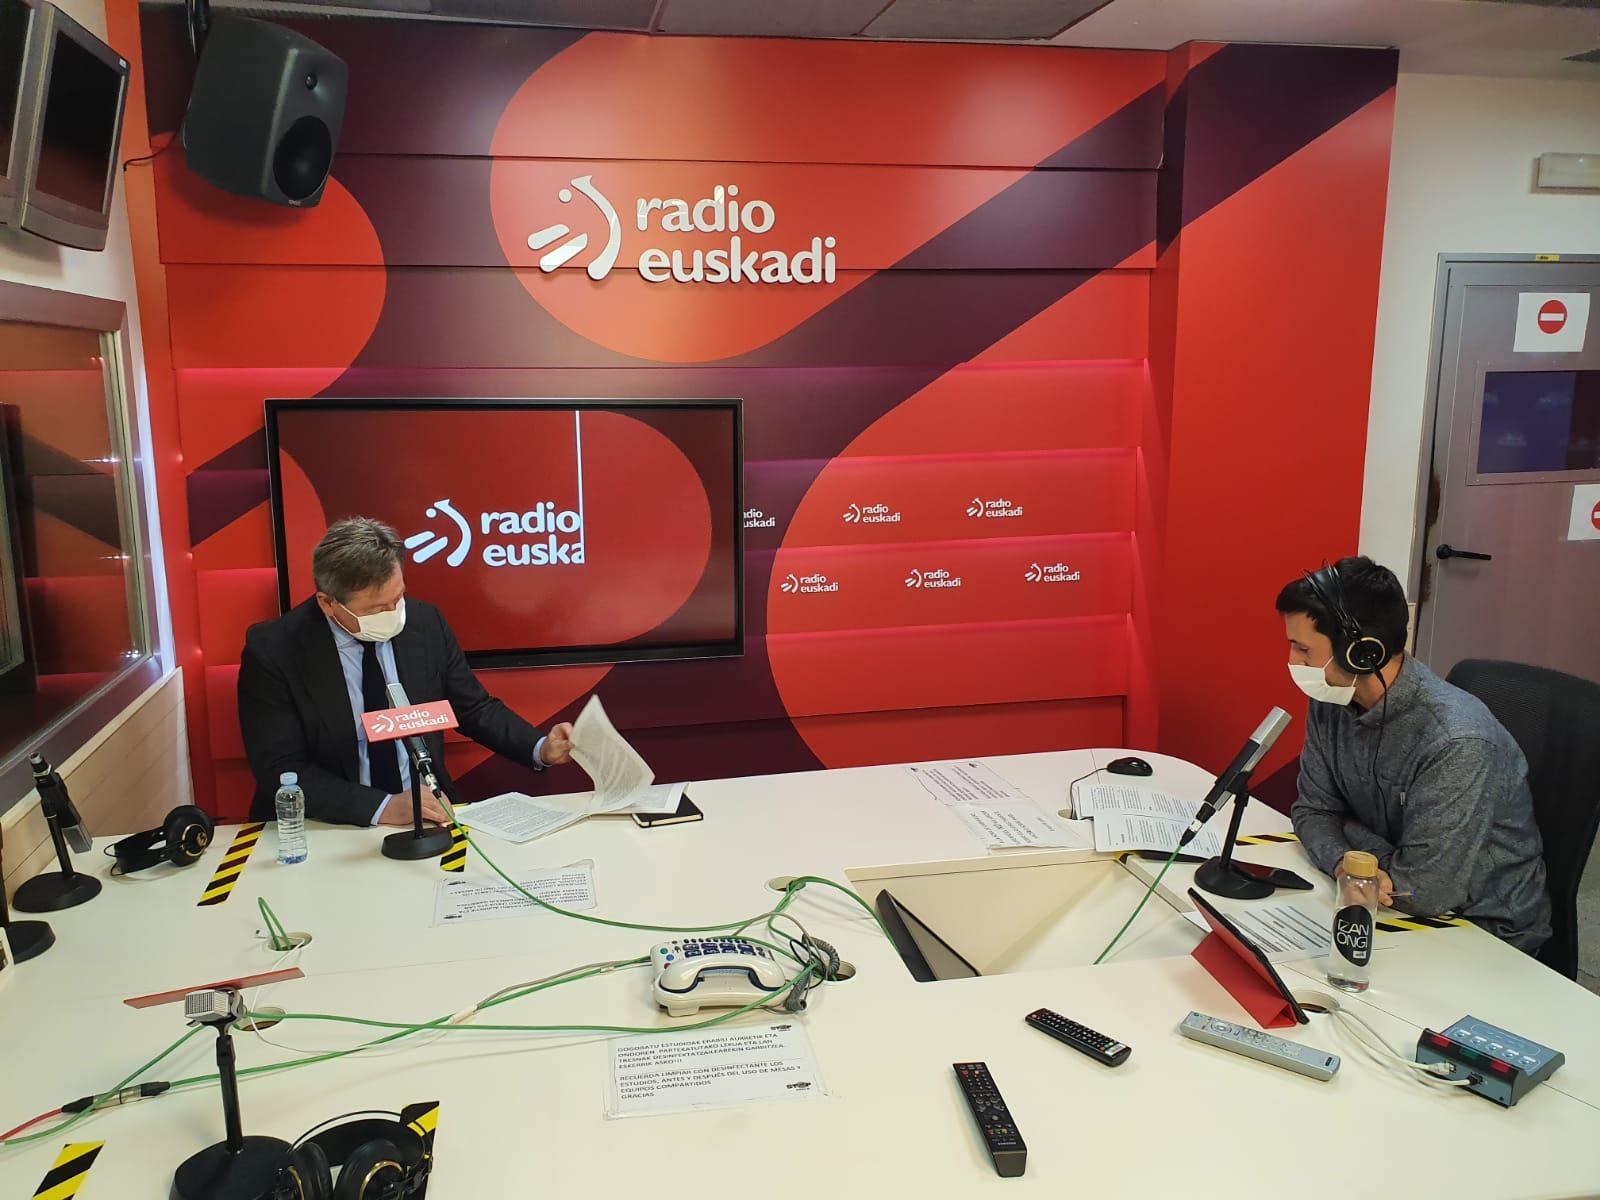 zupiria_radio_euskadi_1.jpg